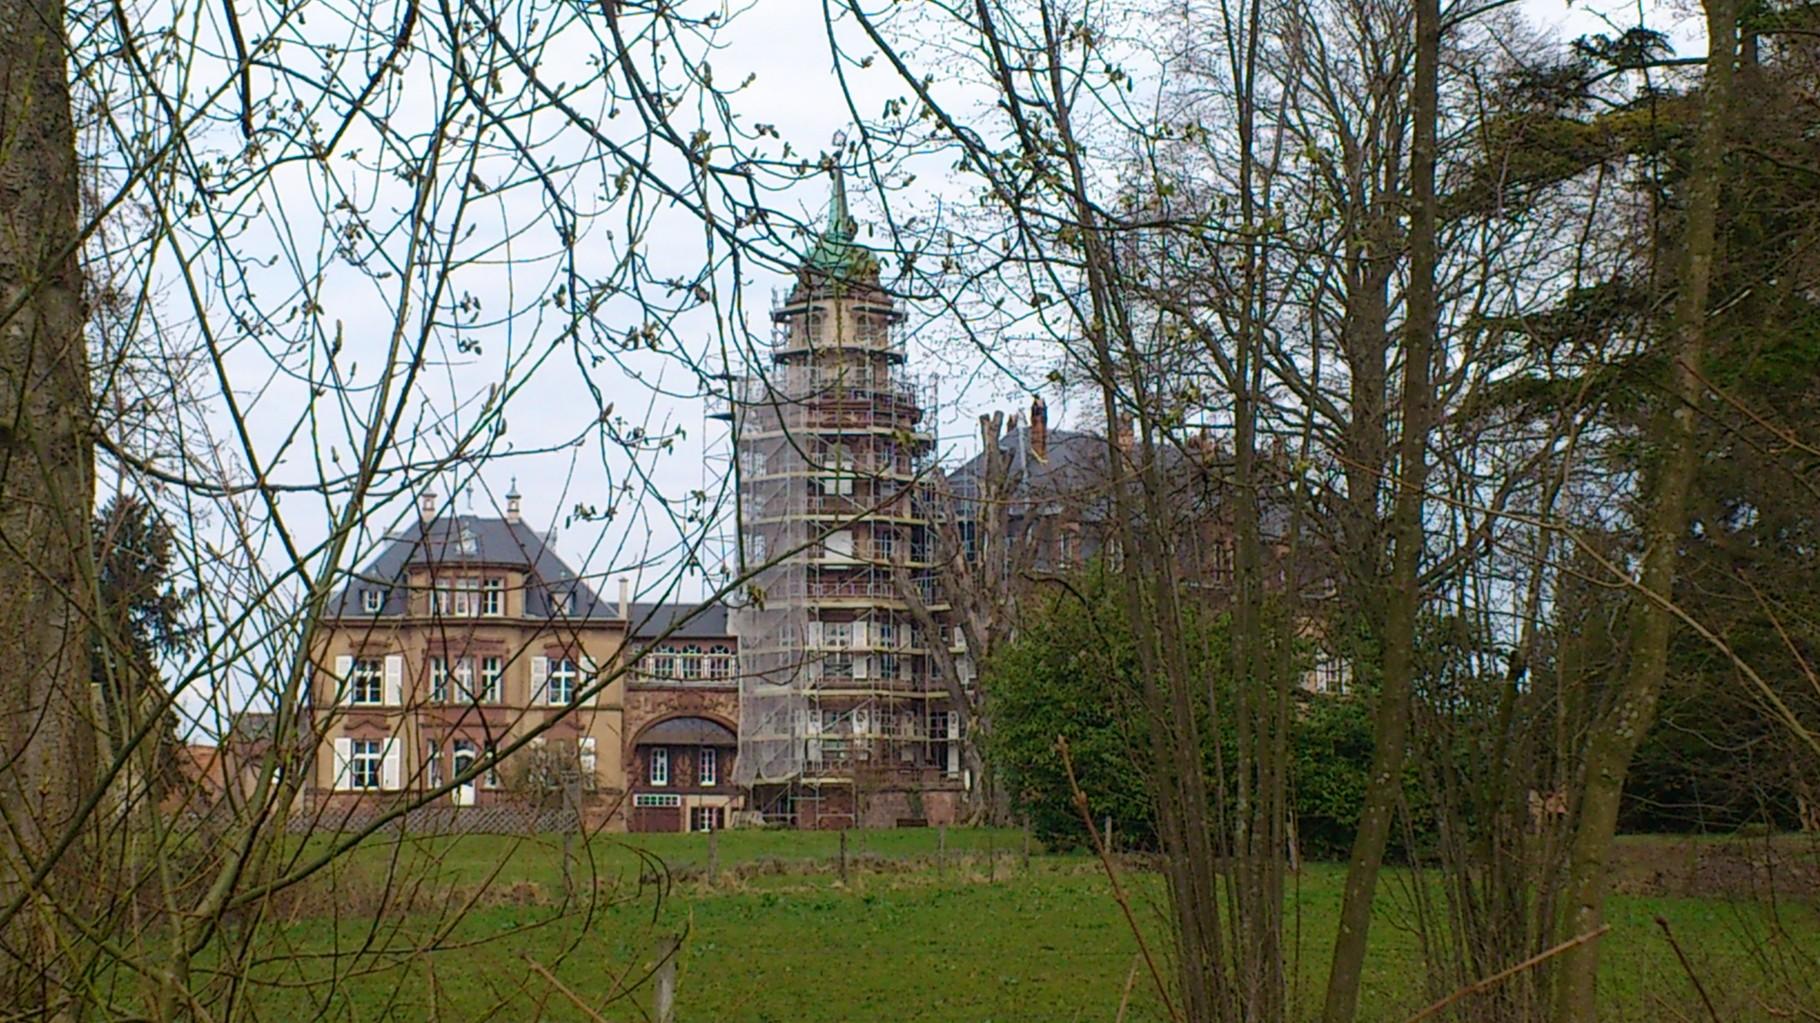 Château de Fœschwiller